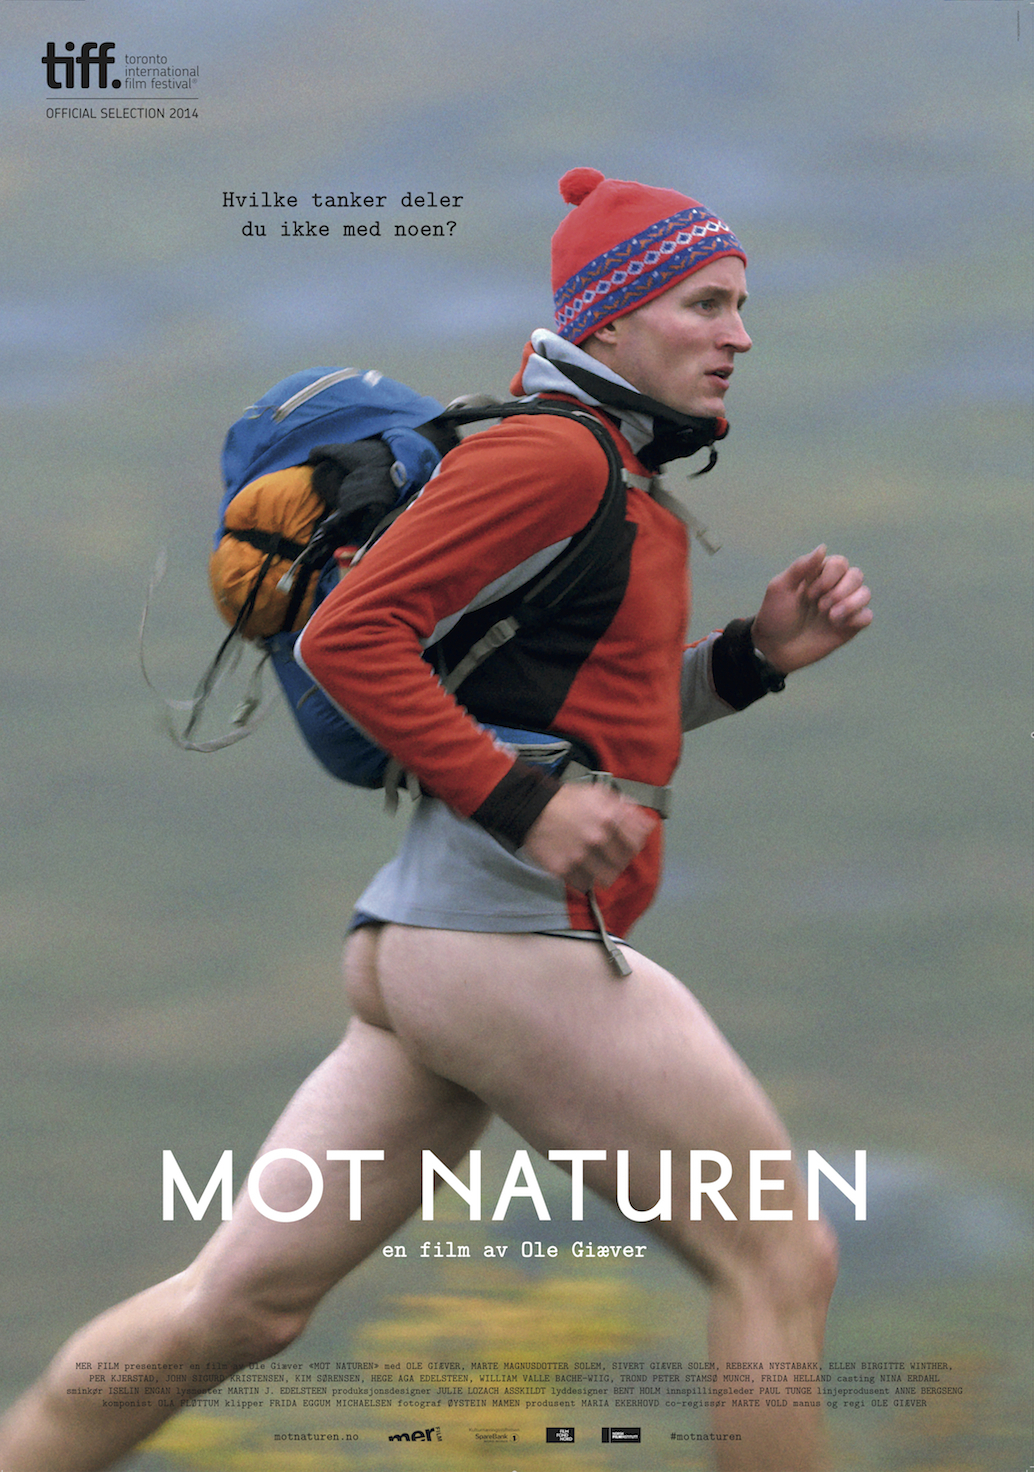 Mot naturen